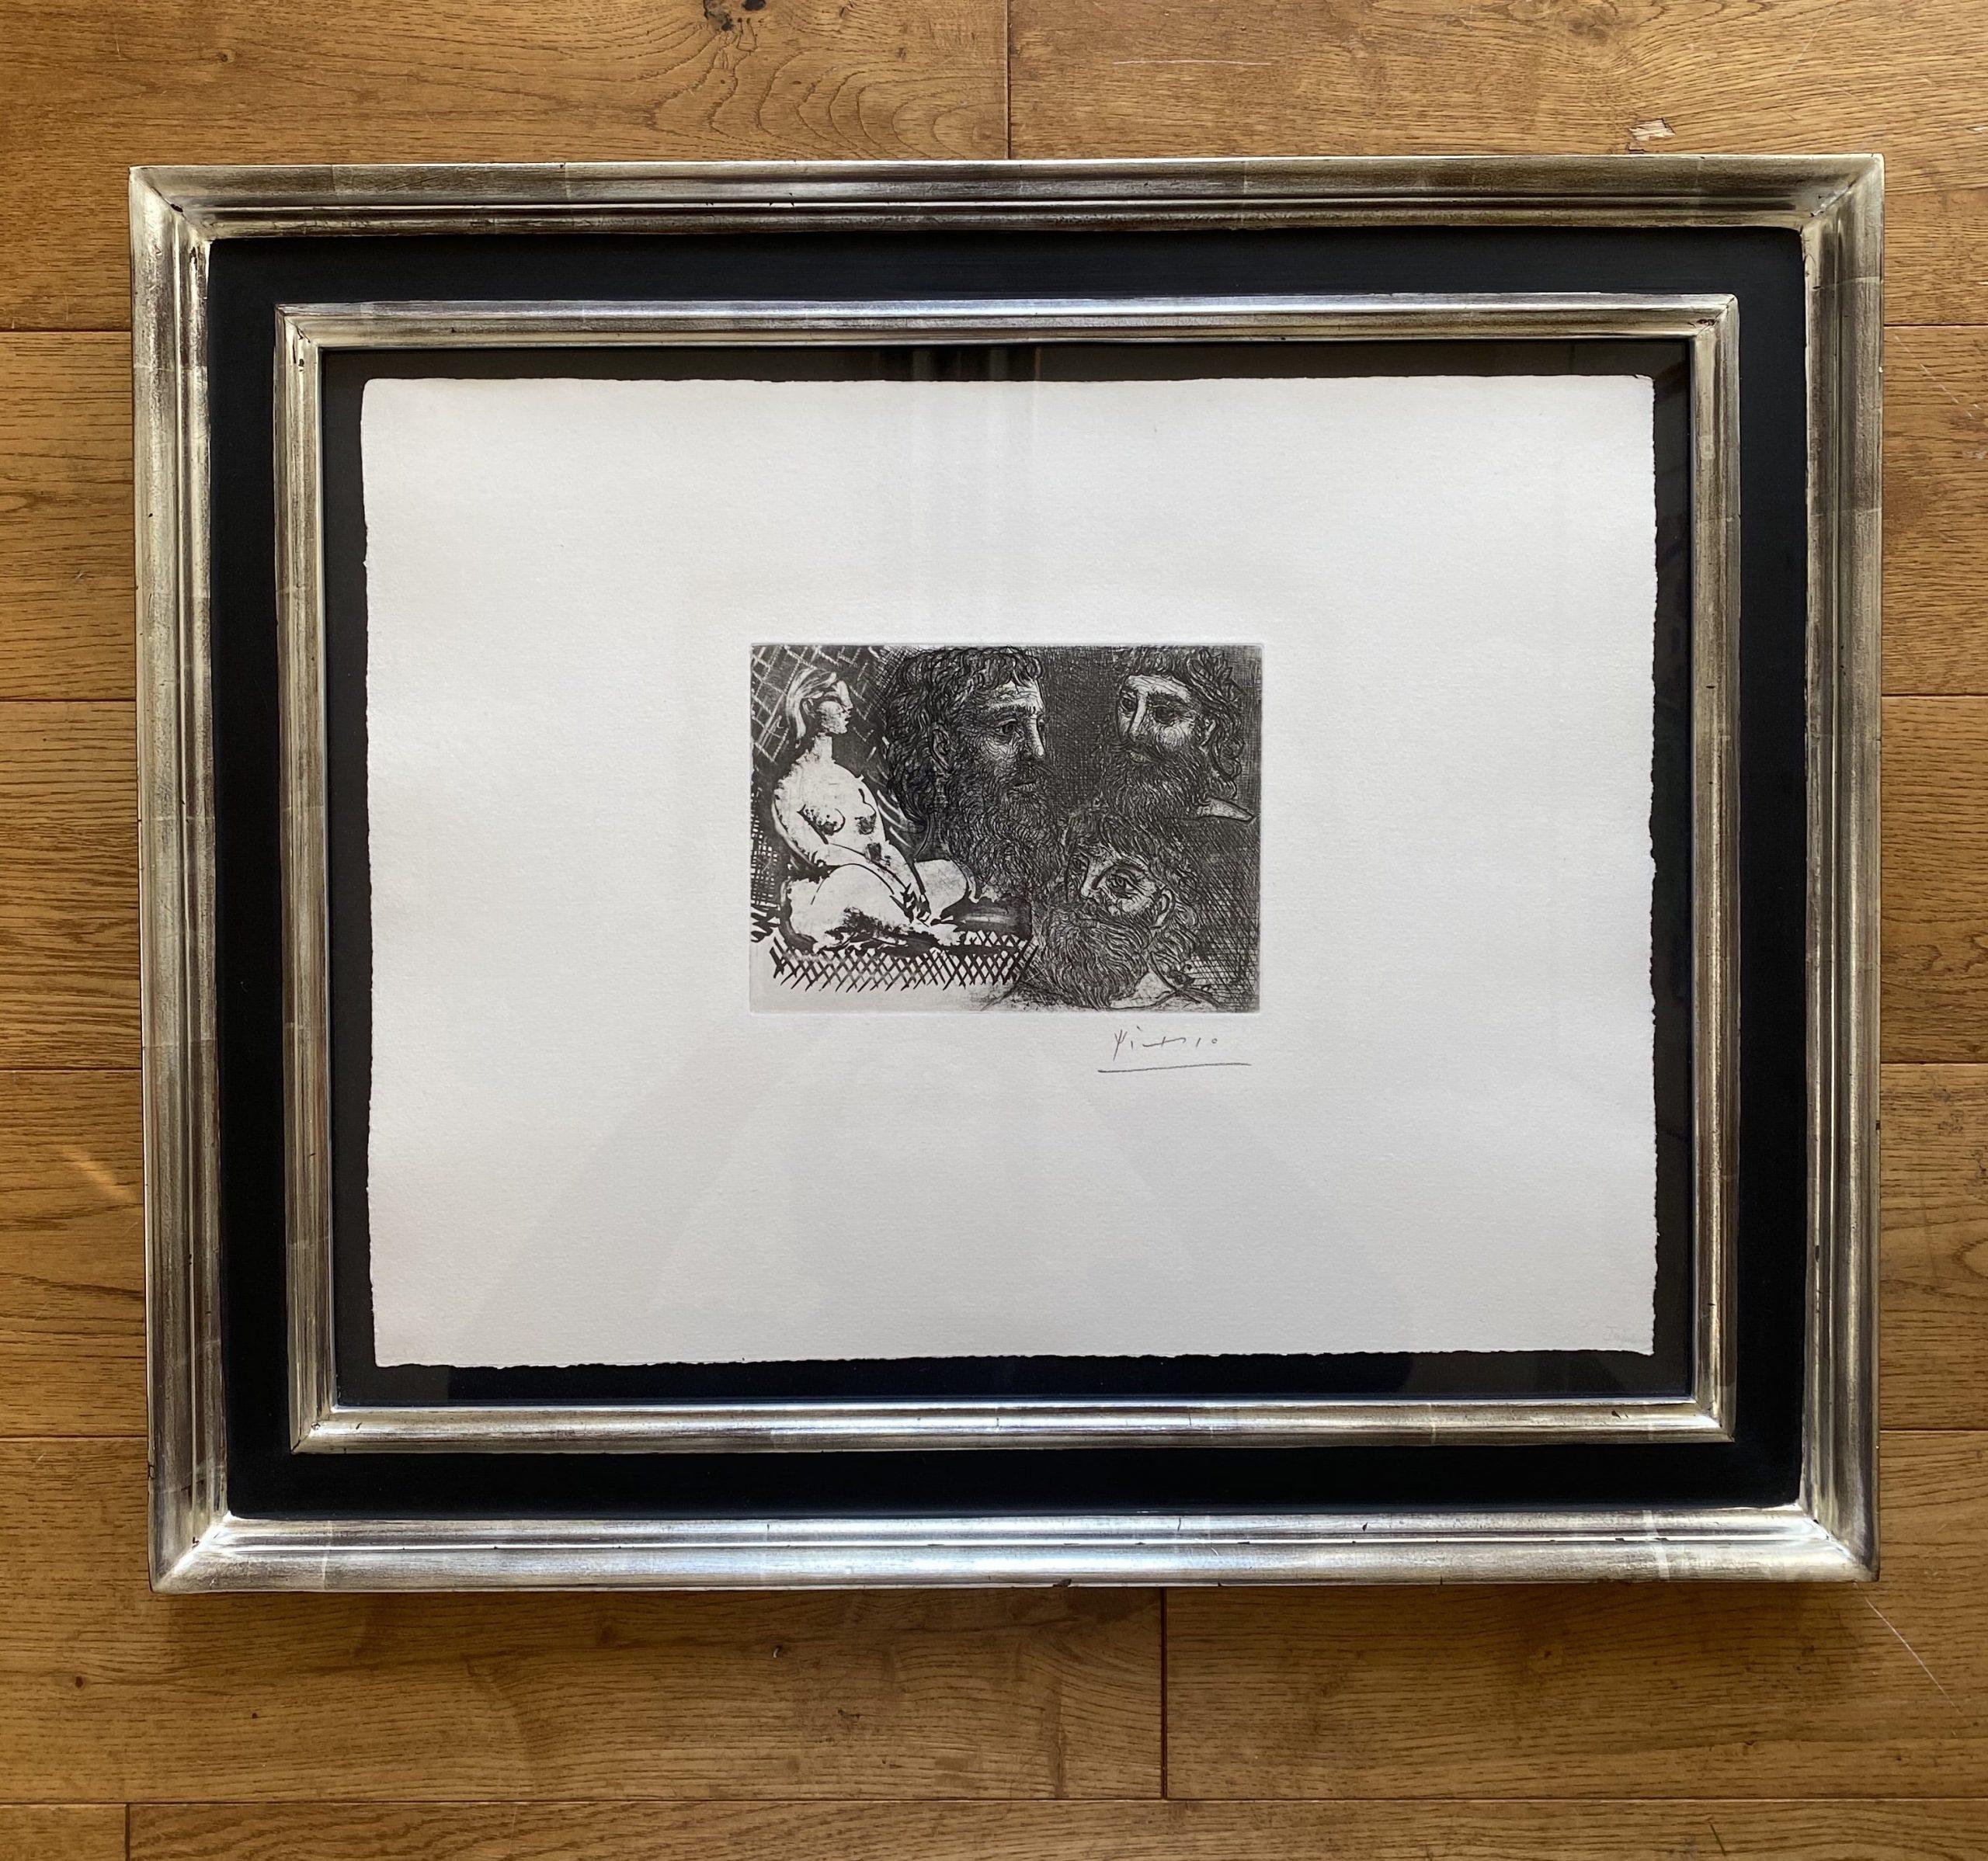 Marie-Therese en idole et trois Grecs Barbus by Pablo Picasso